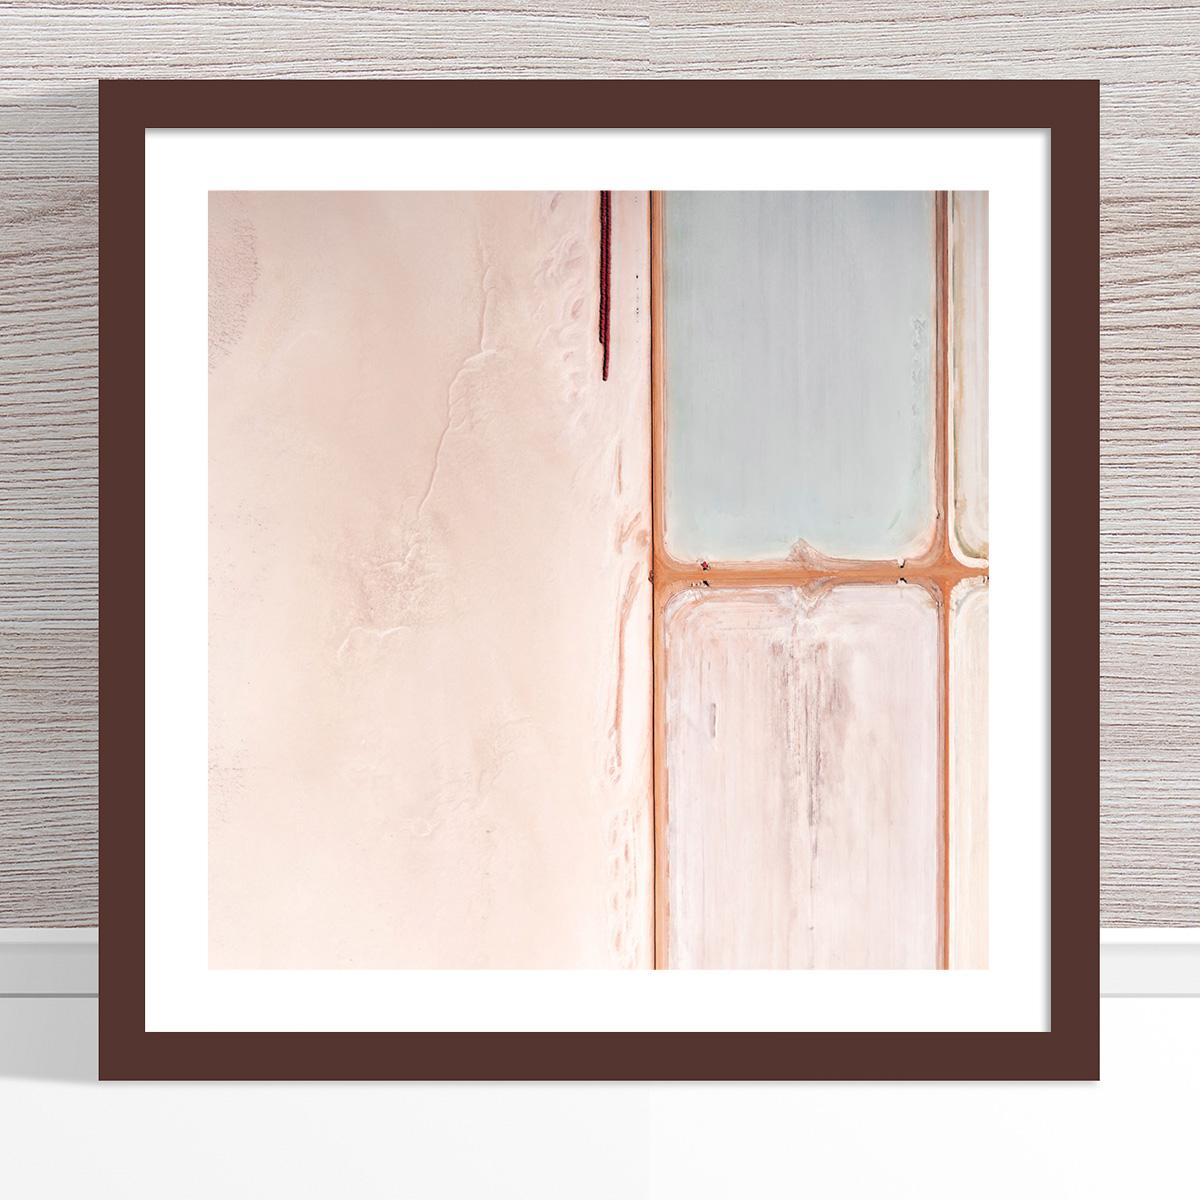 Chris Saunders - 'Aerial Salt 019' Dark Frame